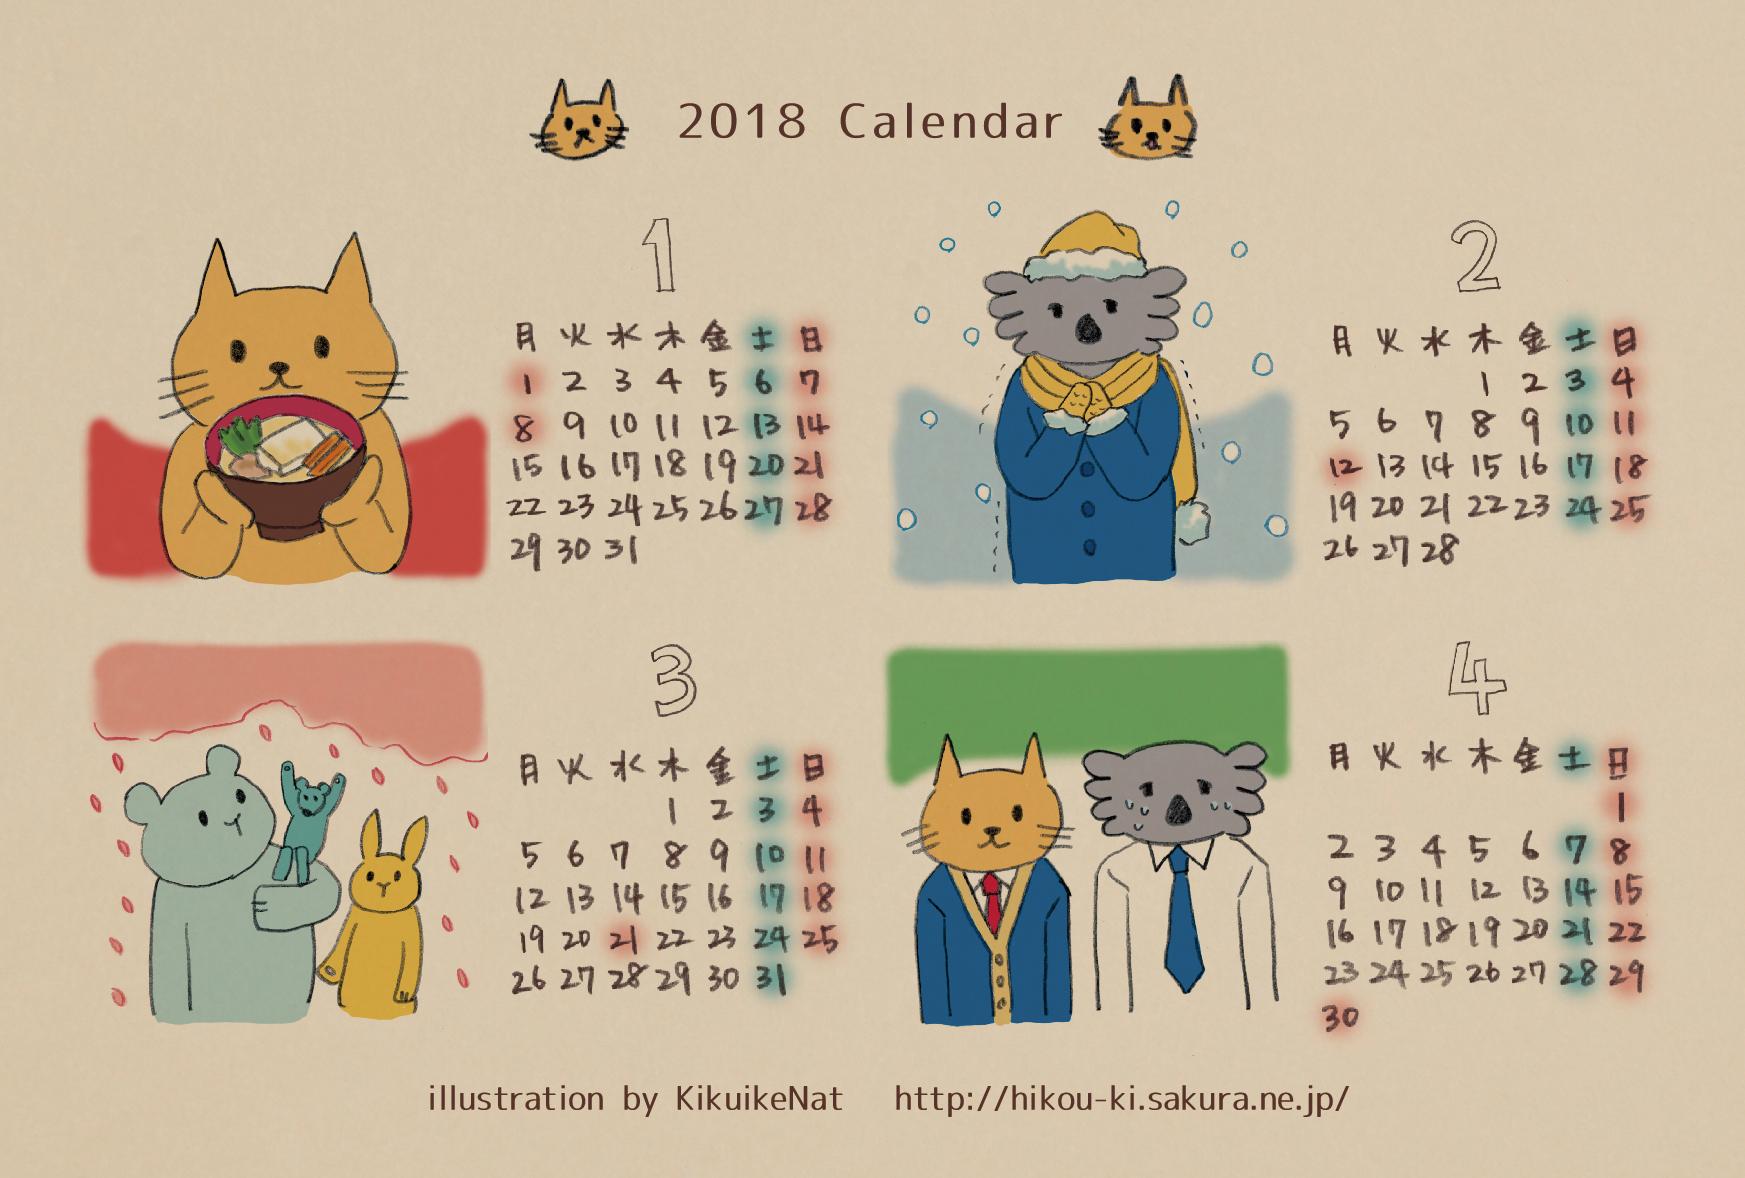 http://cdn-ak.f.st-hatena.com/images/fotolife/k/kikuikenat/20180104/20180104202724_original.jpg?1515065421